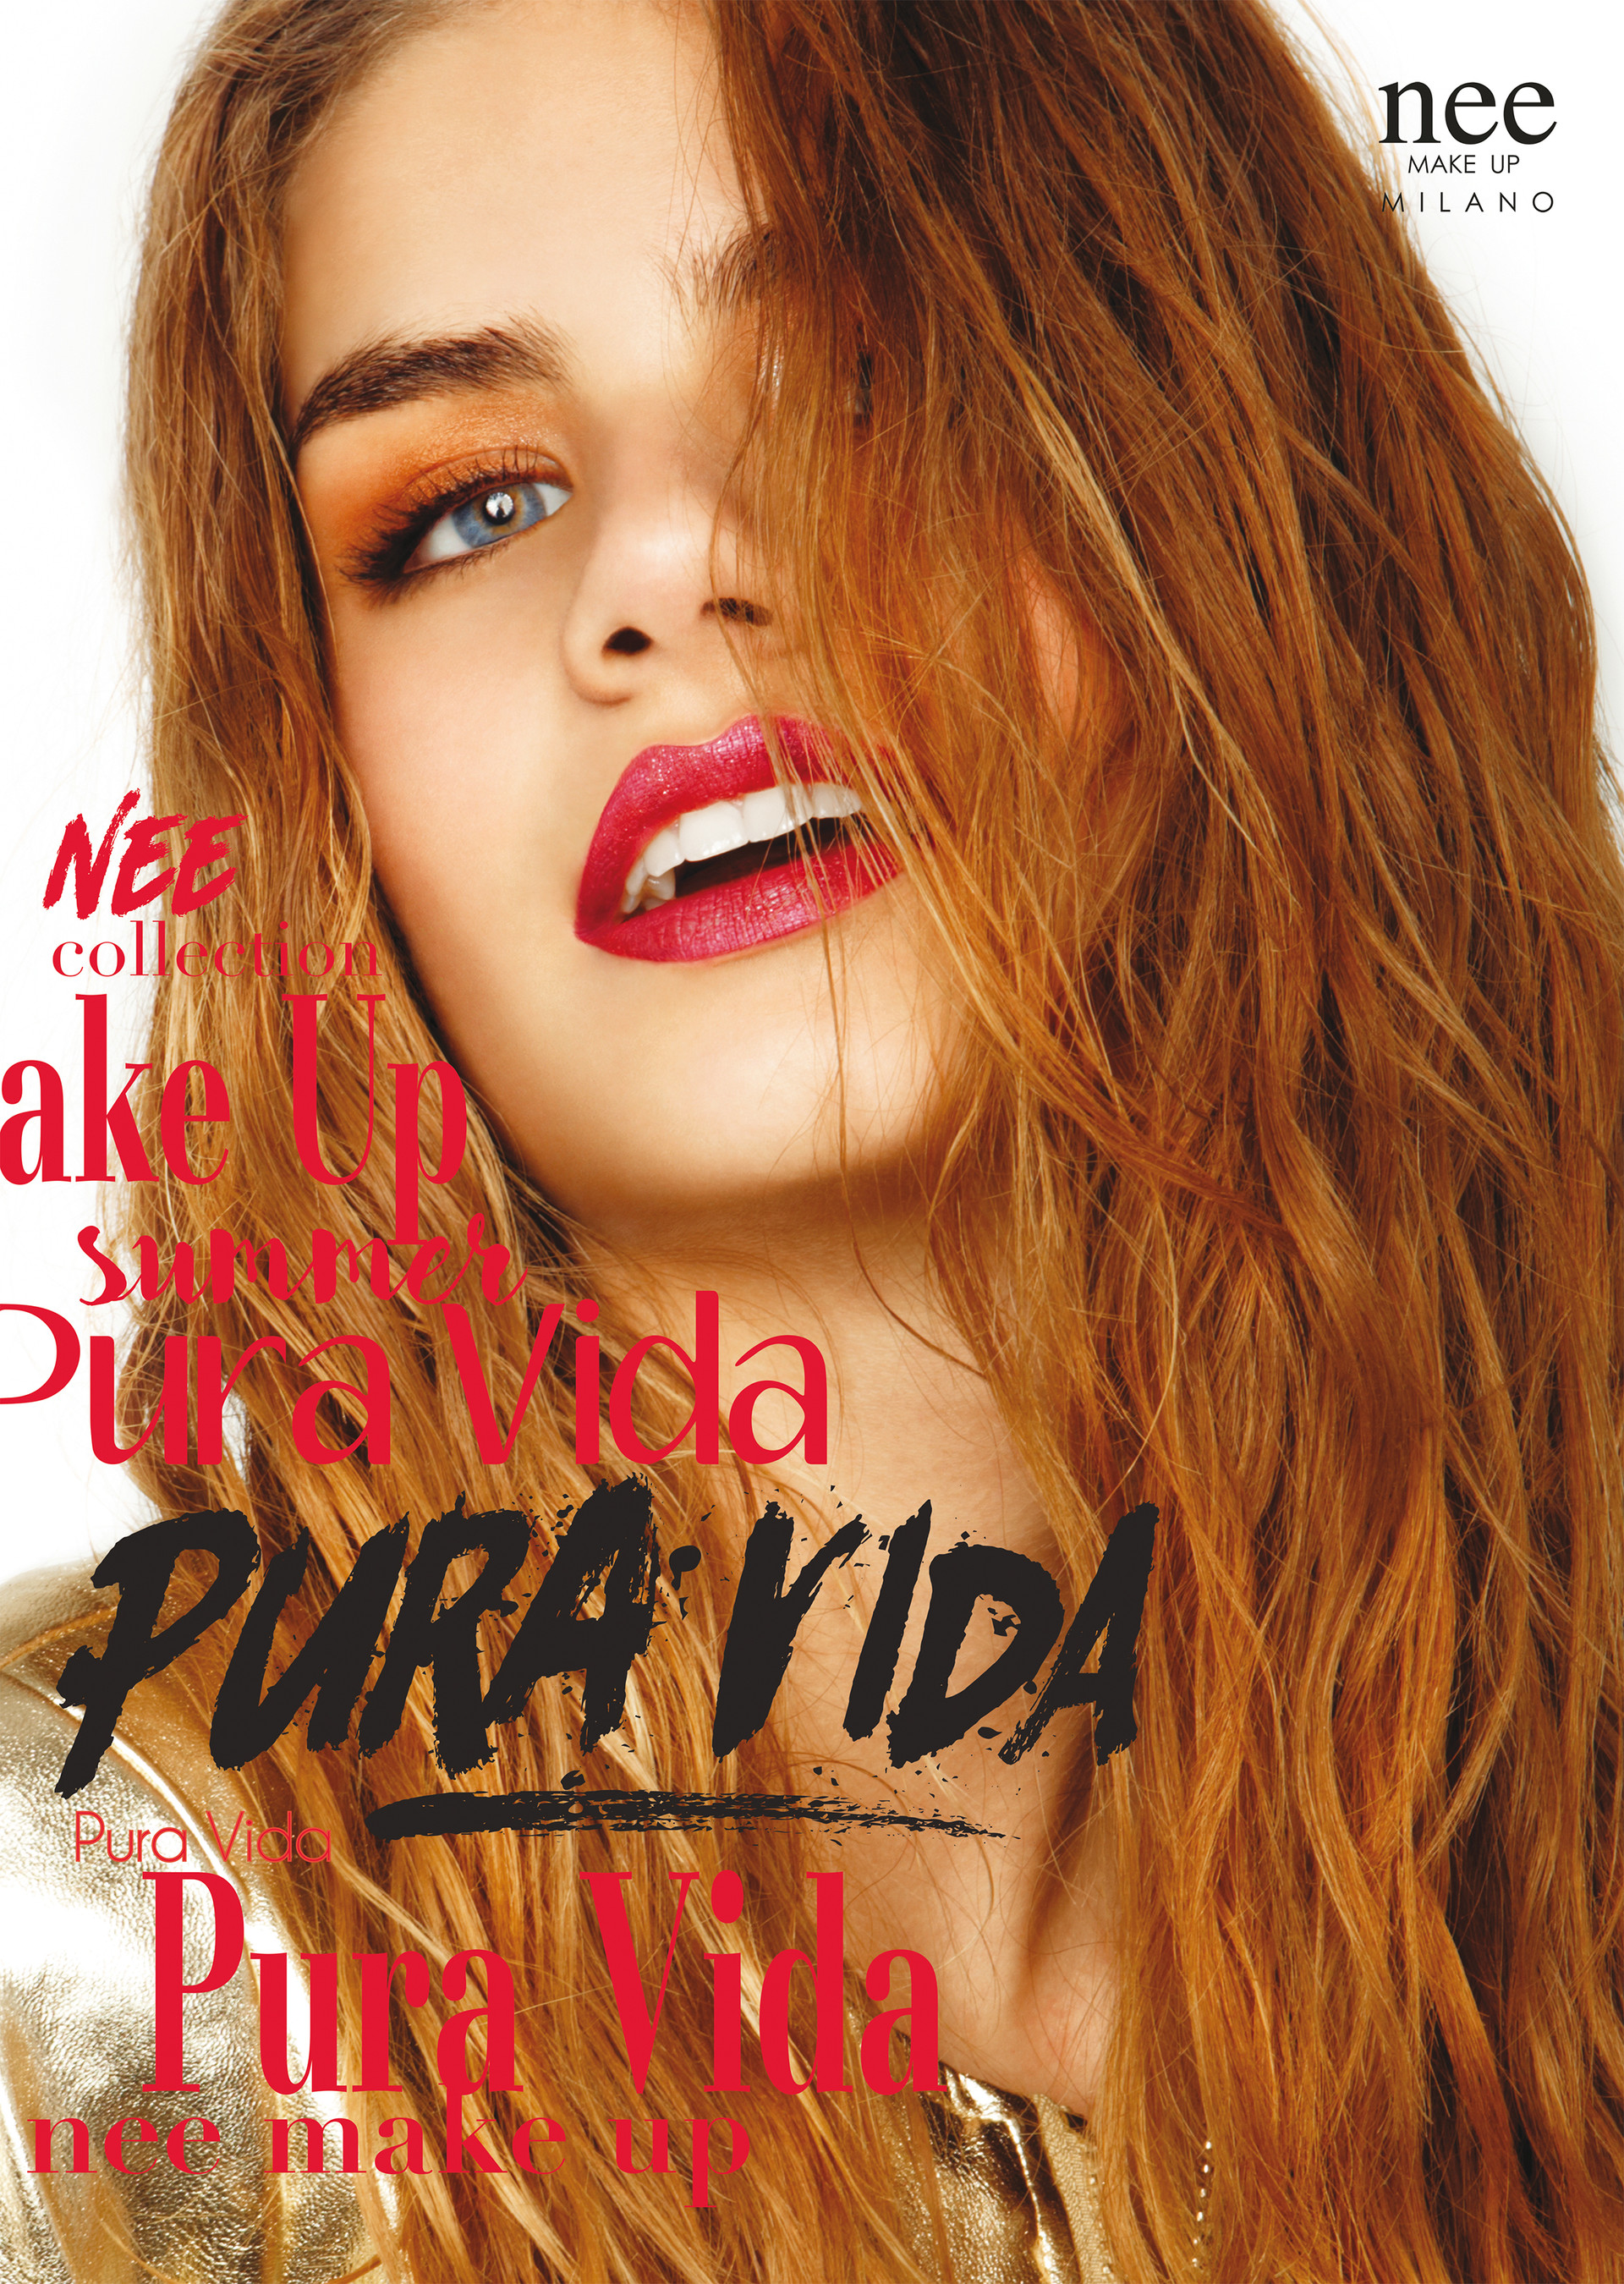 Pura Vida Nee make up campaign